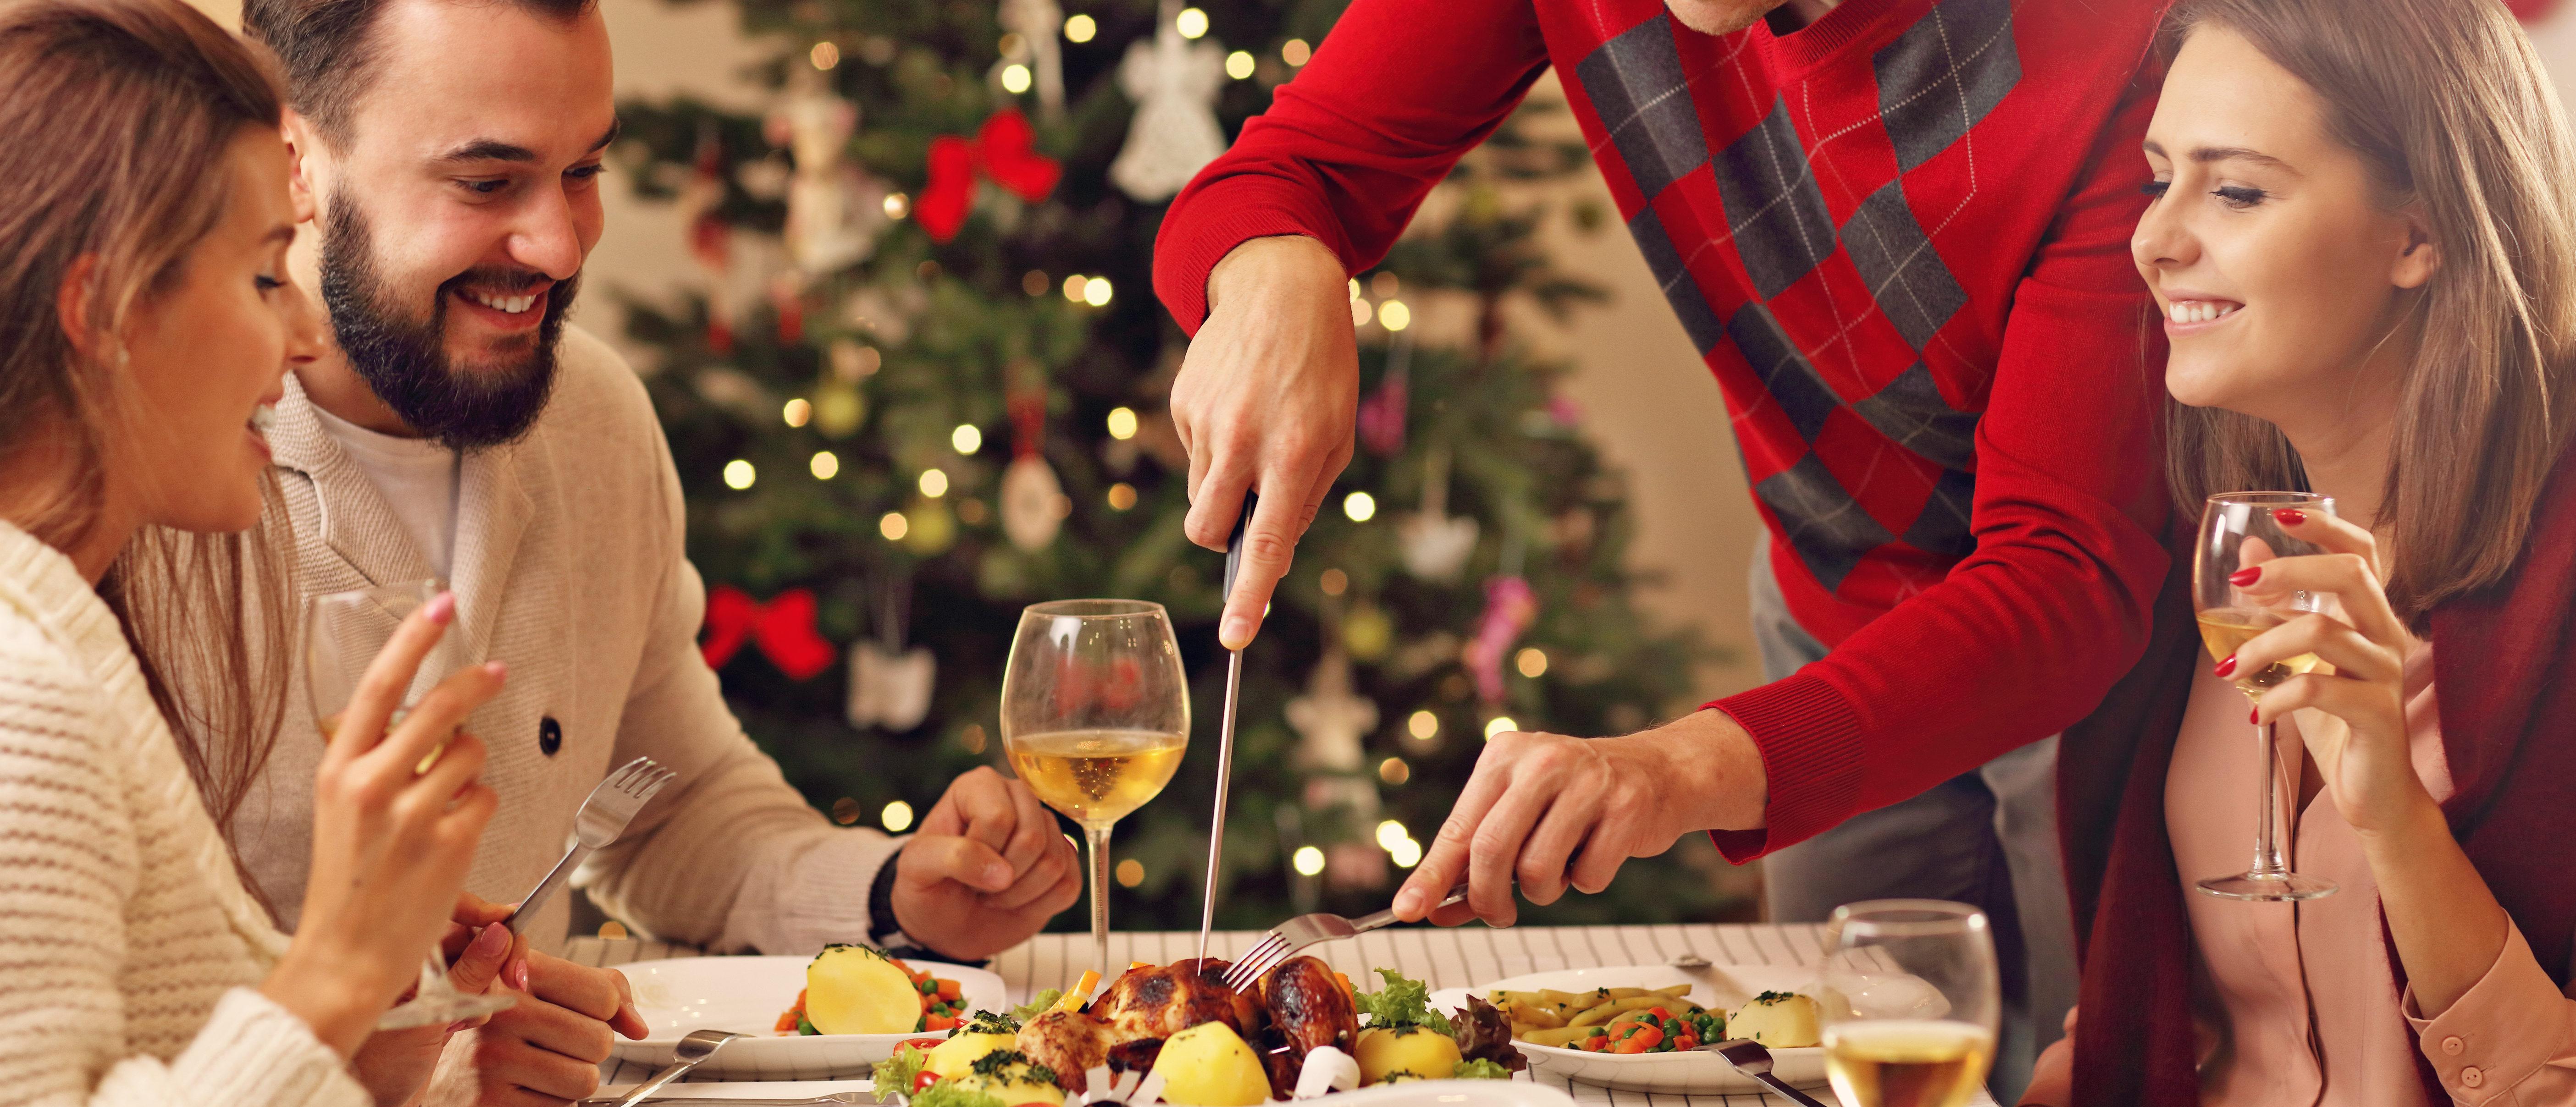 A family eats Christmas dinner. (Shutterstock/Kamil Macniack)